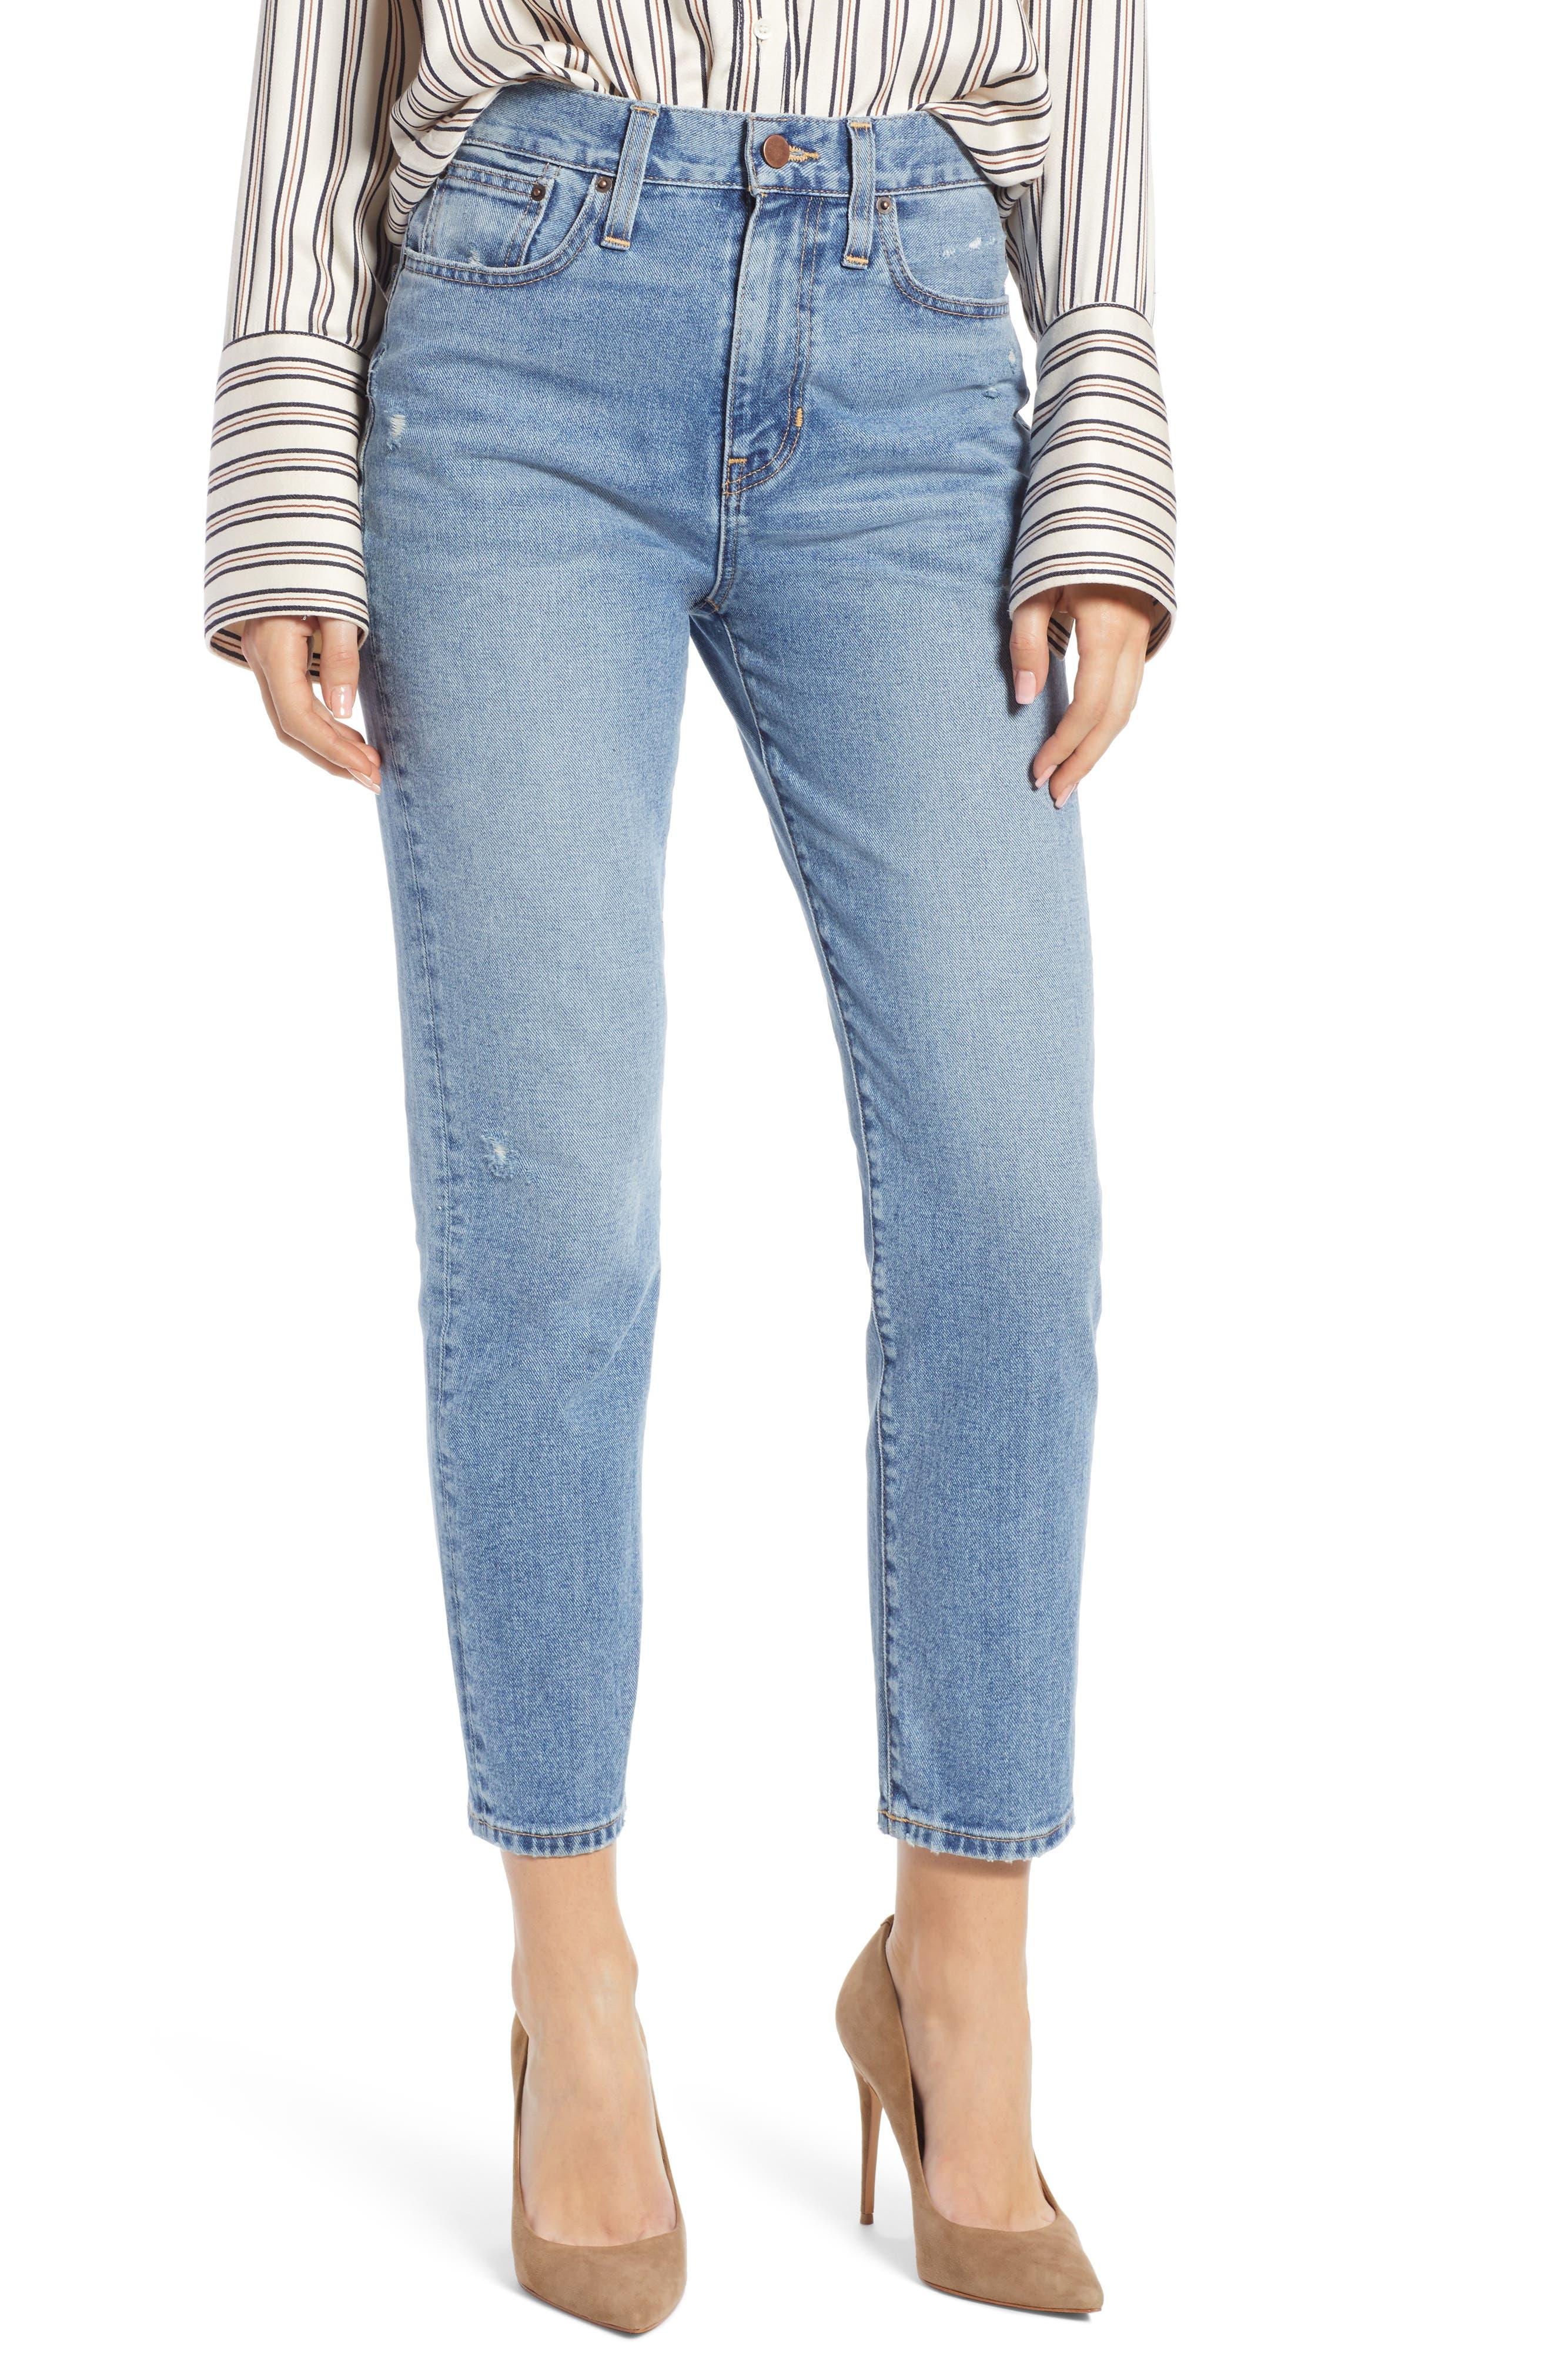 Cigarette Jeans,                         Main,                         color, LIGHT INDIGO WASH